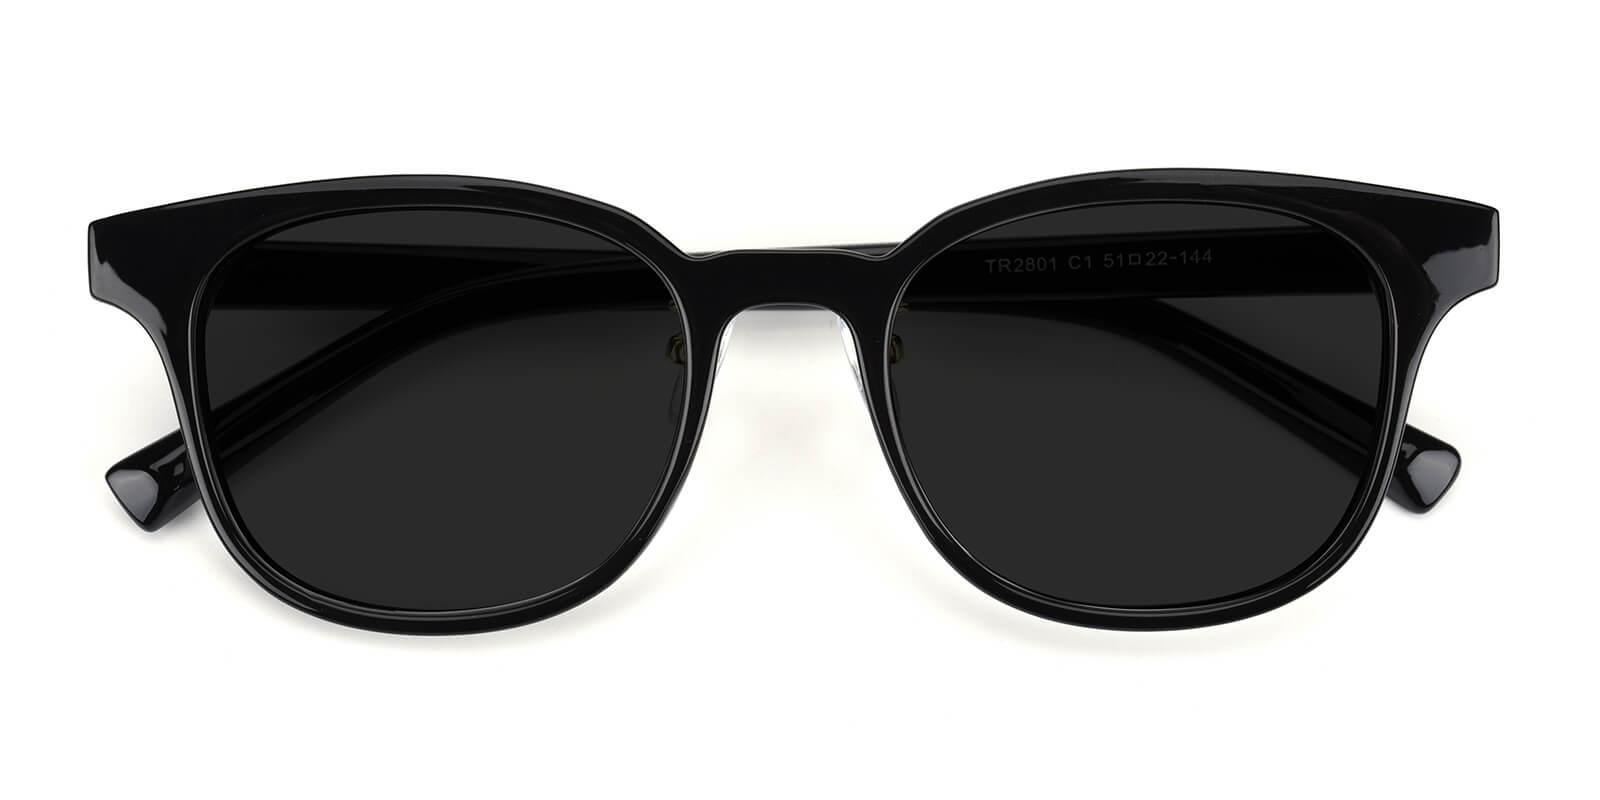 Soyok-Black-Square / Cat-TR-Sunglasses-detail